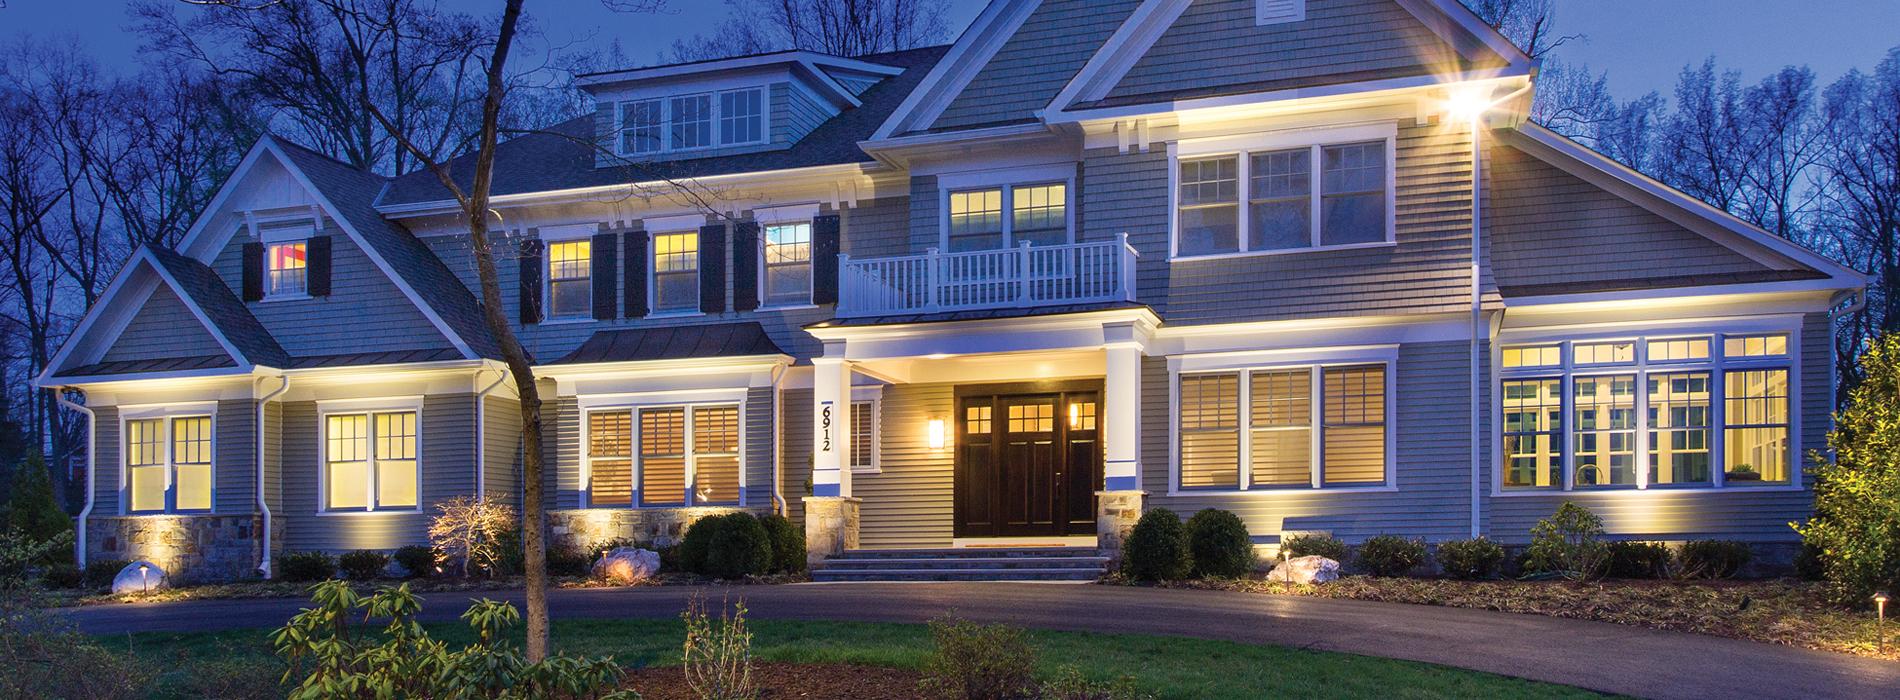 Studio Z Home Design Part - 48: Studio Z Design Concepts, LLC